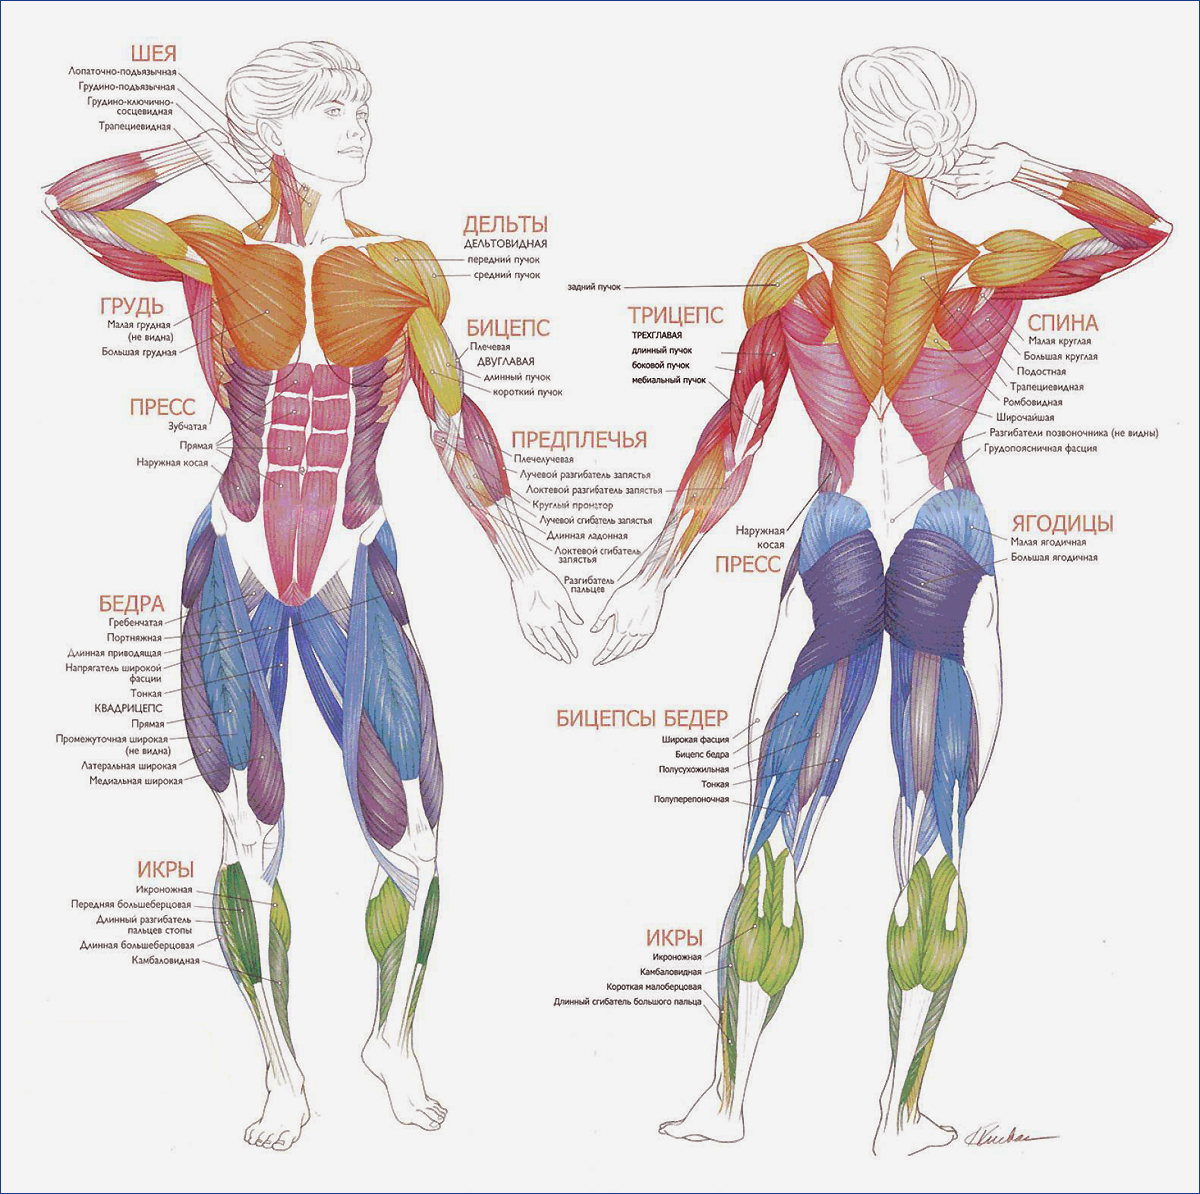 Суставы при плавании лечение артроза i плюснефалангового сустава